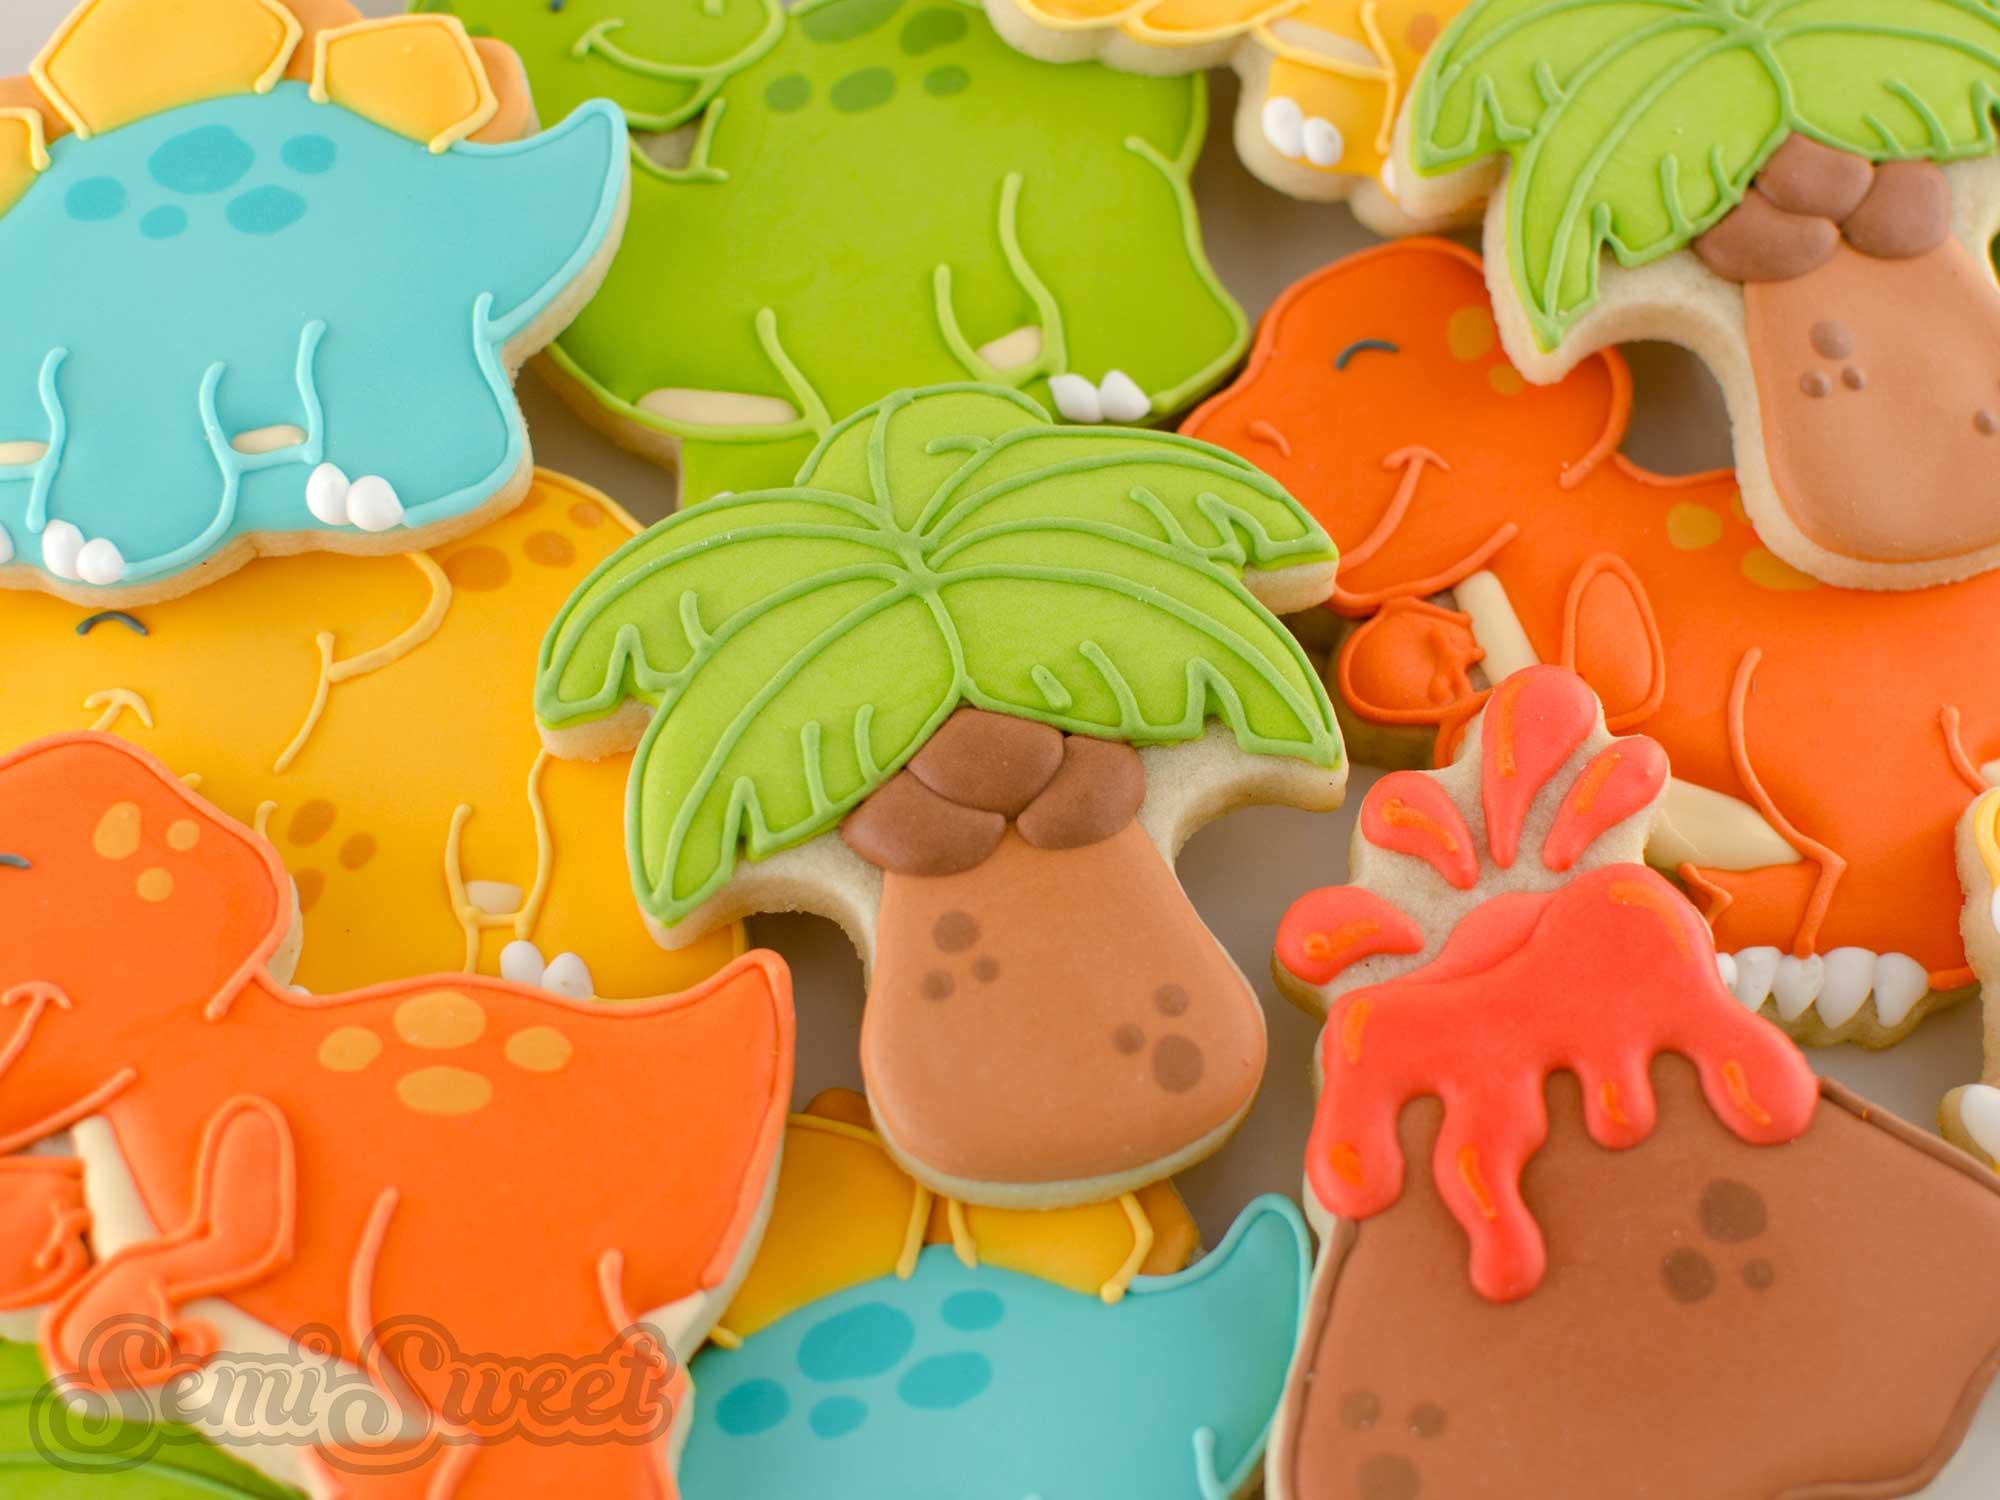 How to Make Sturdy Palm Tree Cookies